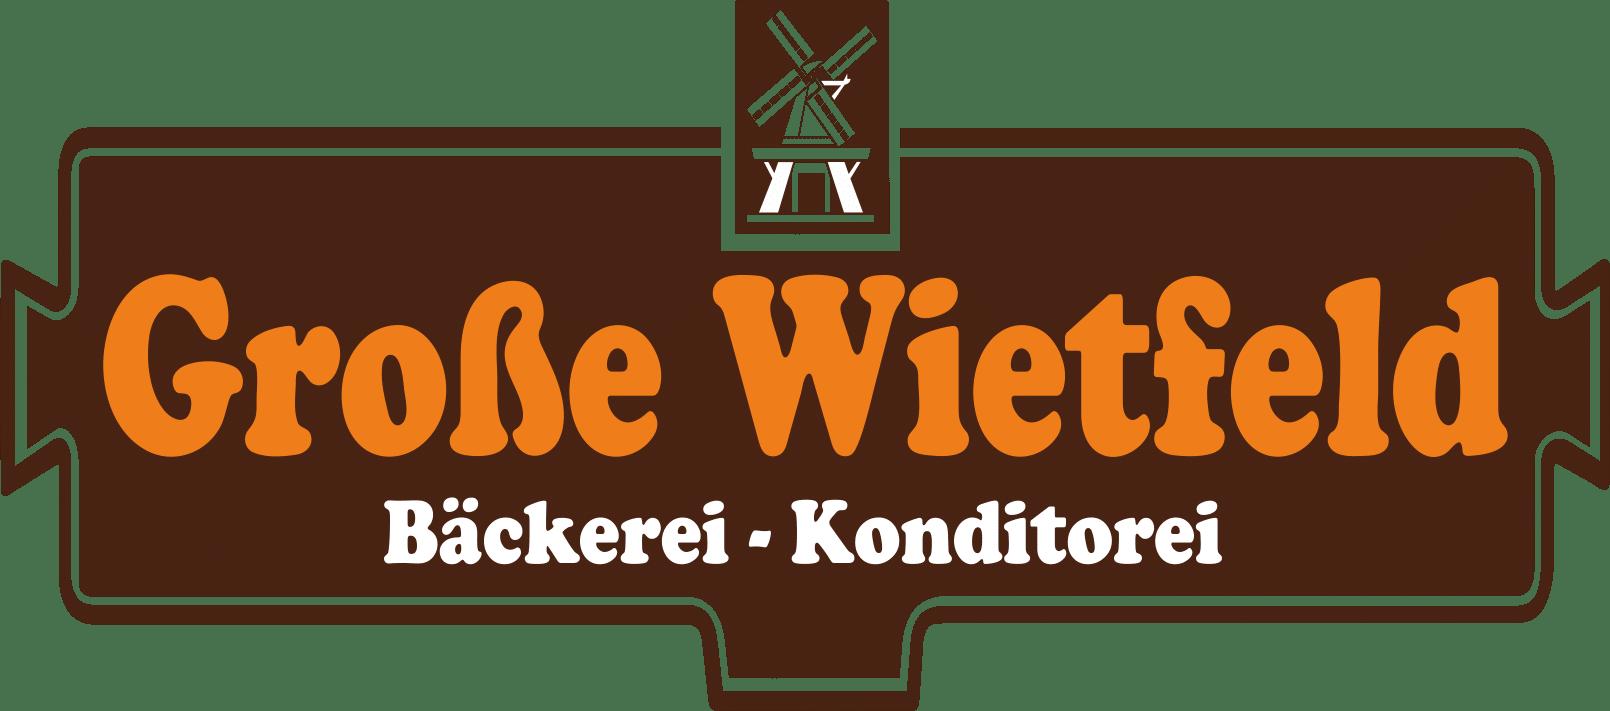 Bäckerei Große Wietfeld GmbH